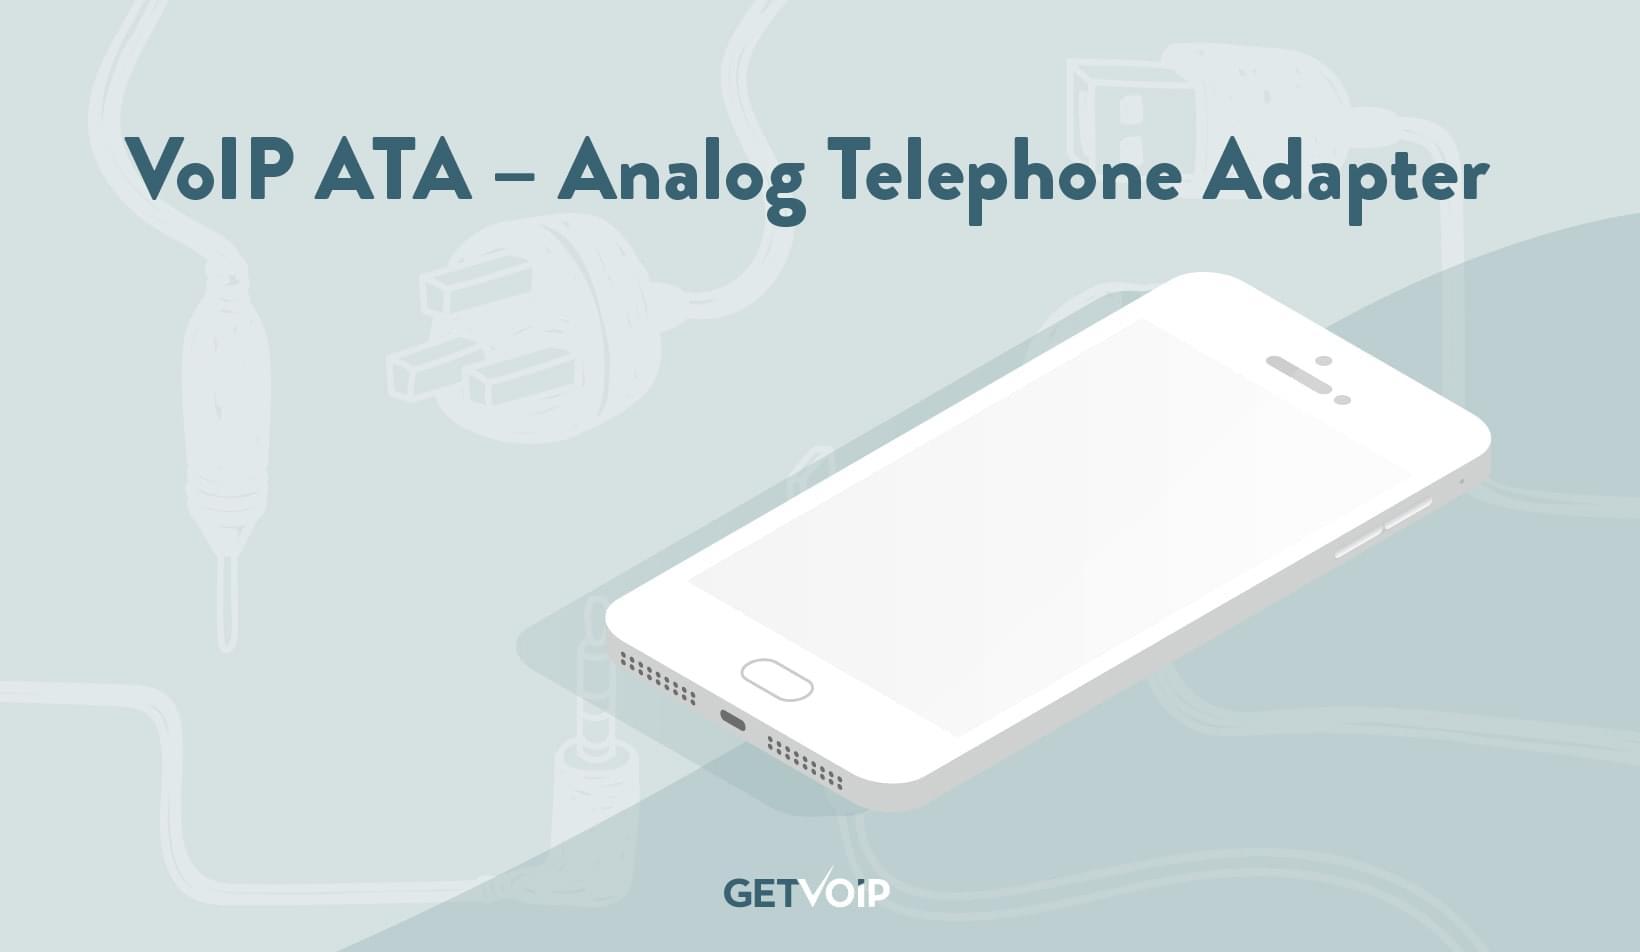 VoIP ATA – Analog Telephone Adapter